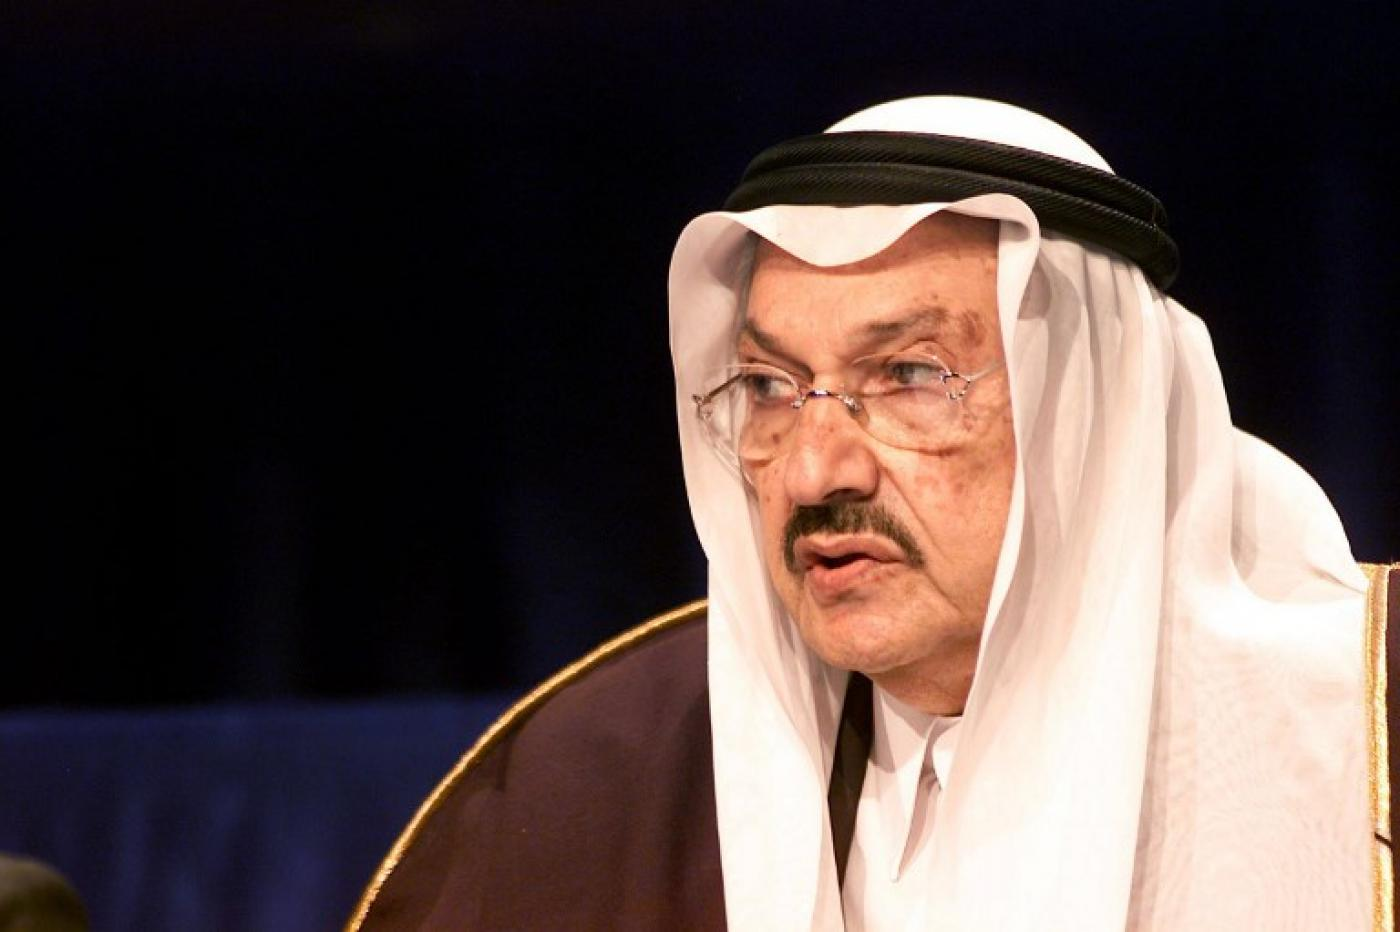 EXCLUSIVE: Senior Saudi royal on hunger strike over purge